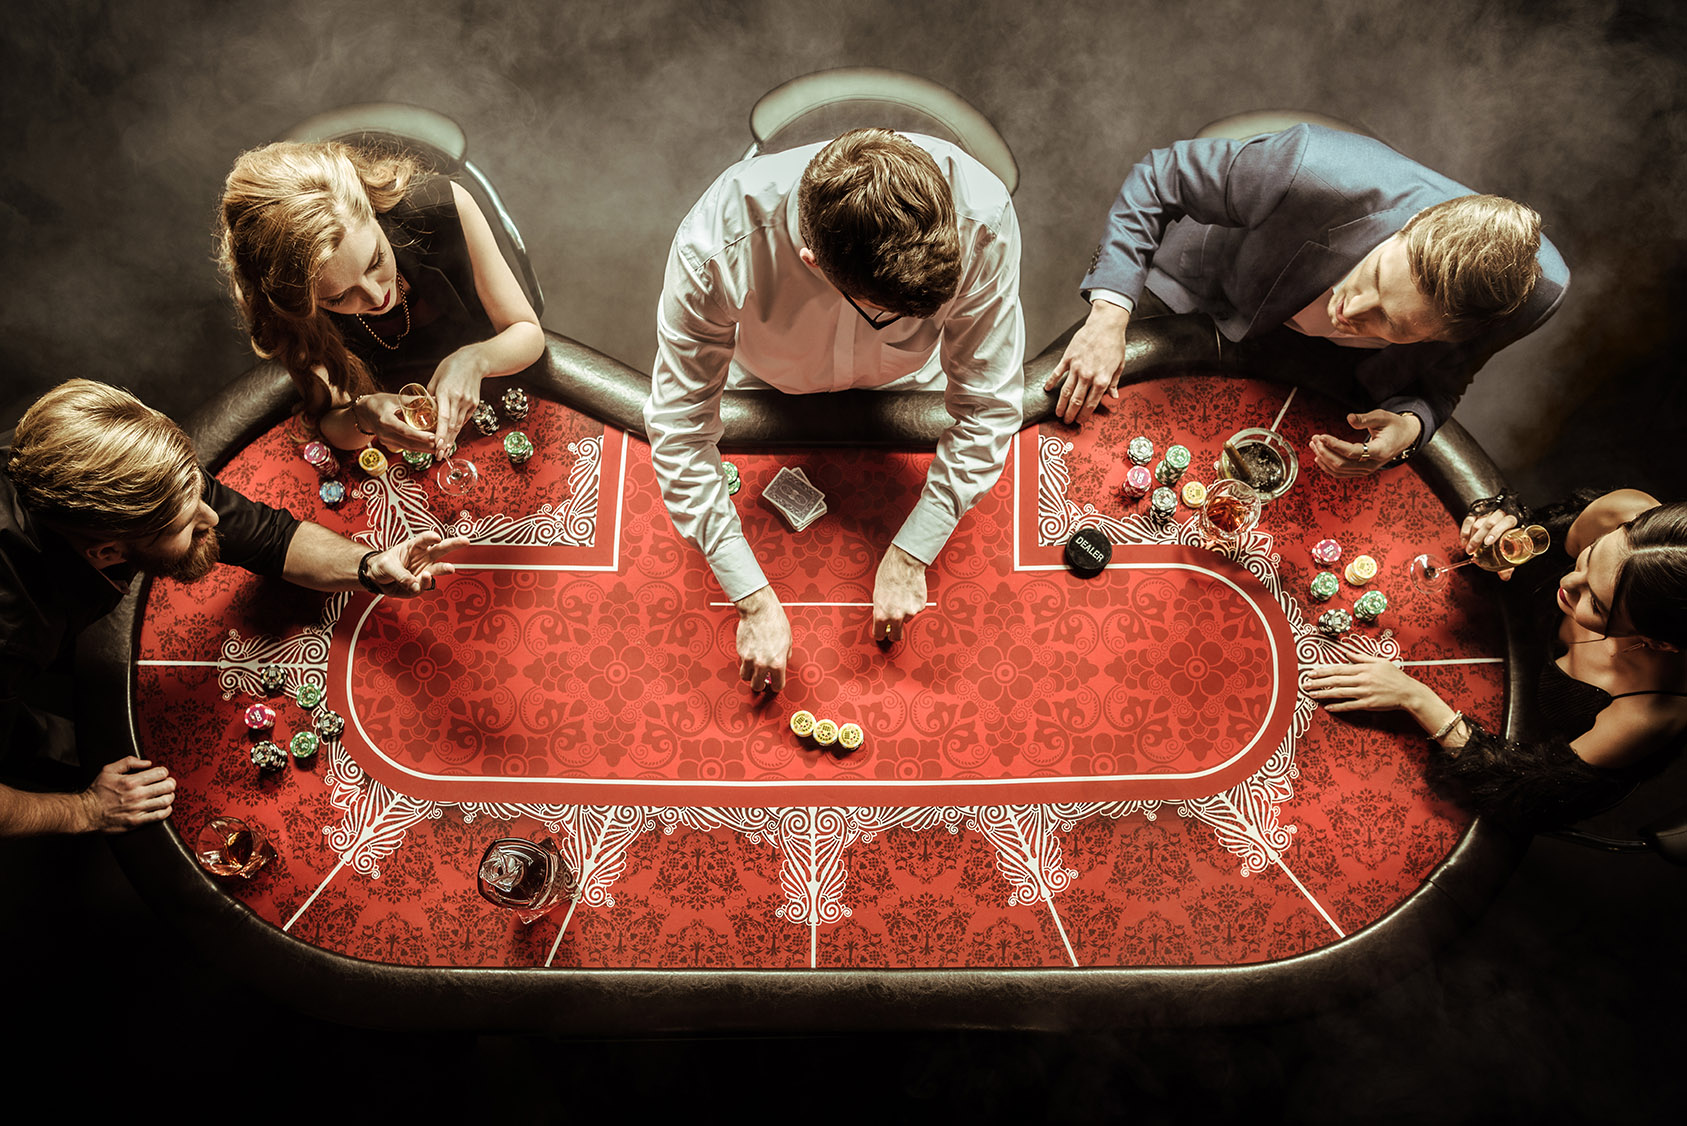 Casinoabend selber machen